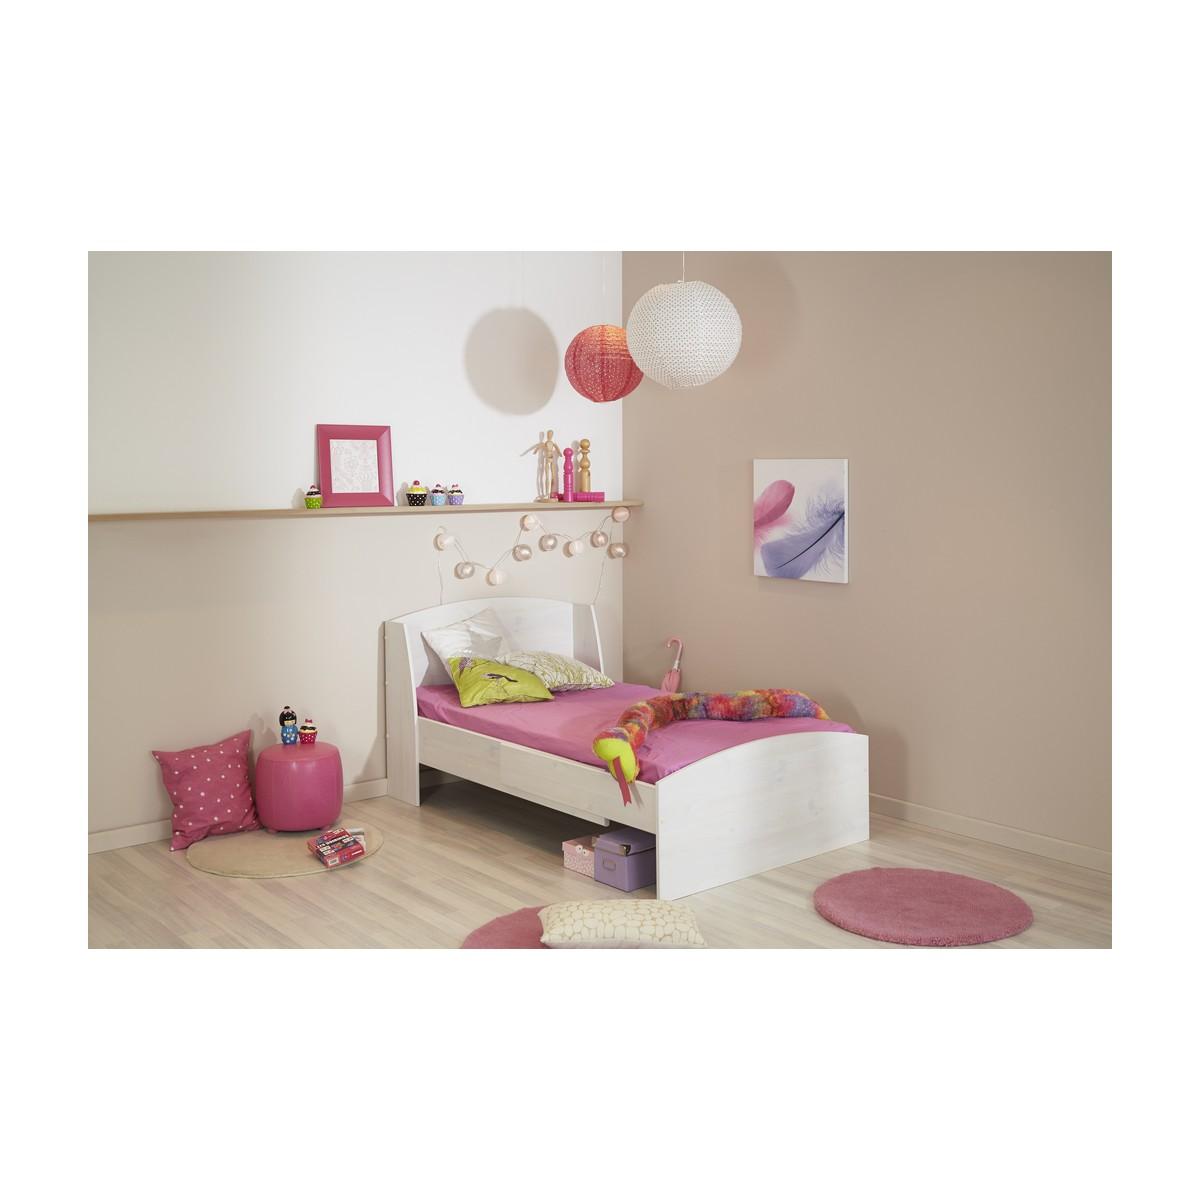 Passer b b un grand lit mais volutif - Montage d un lit evolutif ...